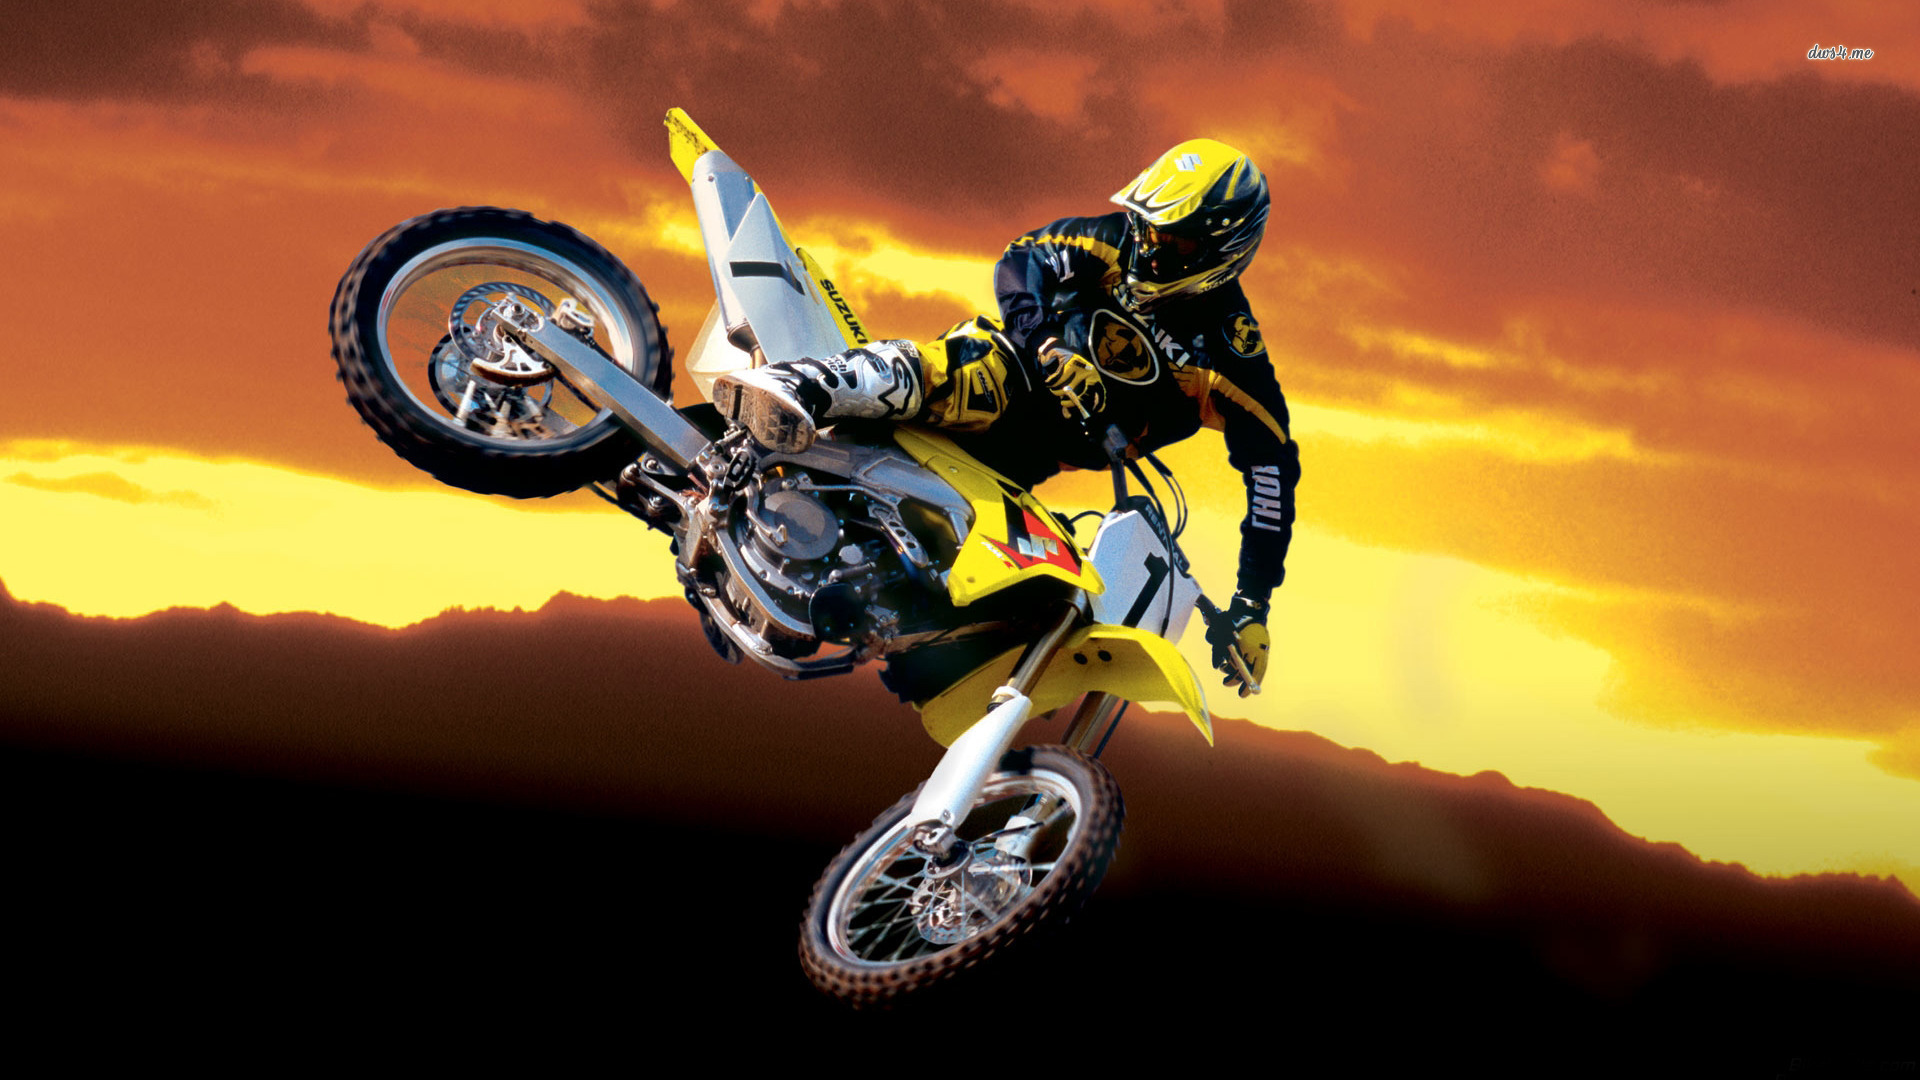 Picture Suzuki Motocross Rmz Wallpaper